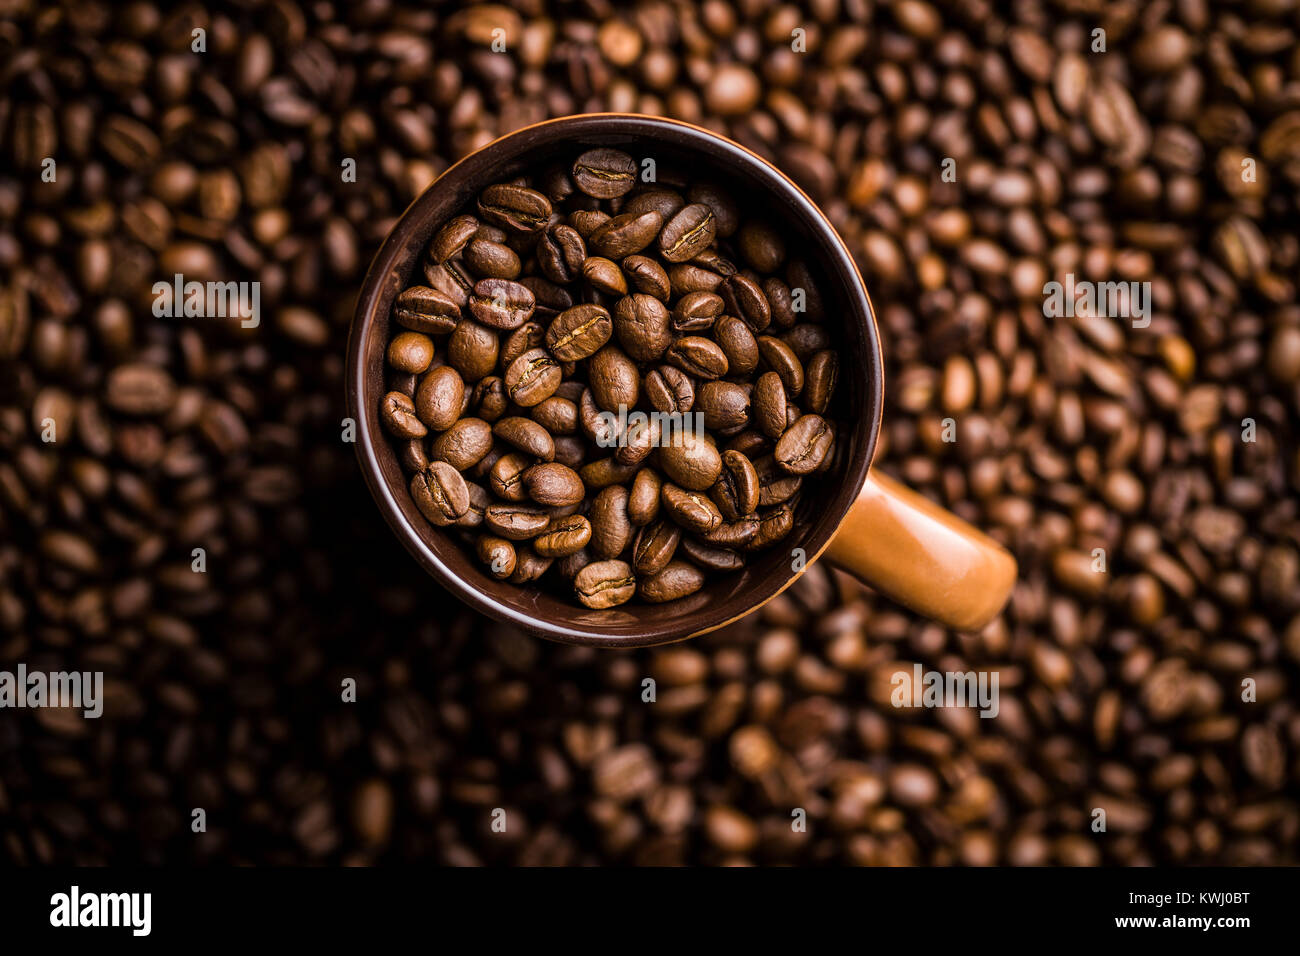 Roasted coffee beans in mug. Stock Photo